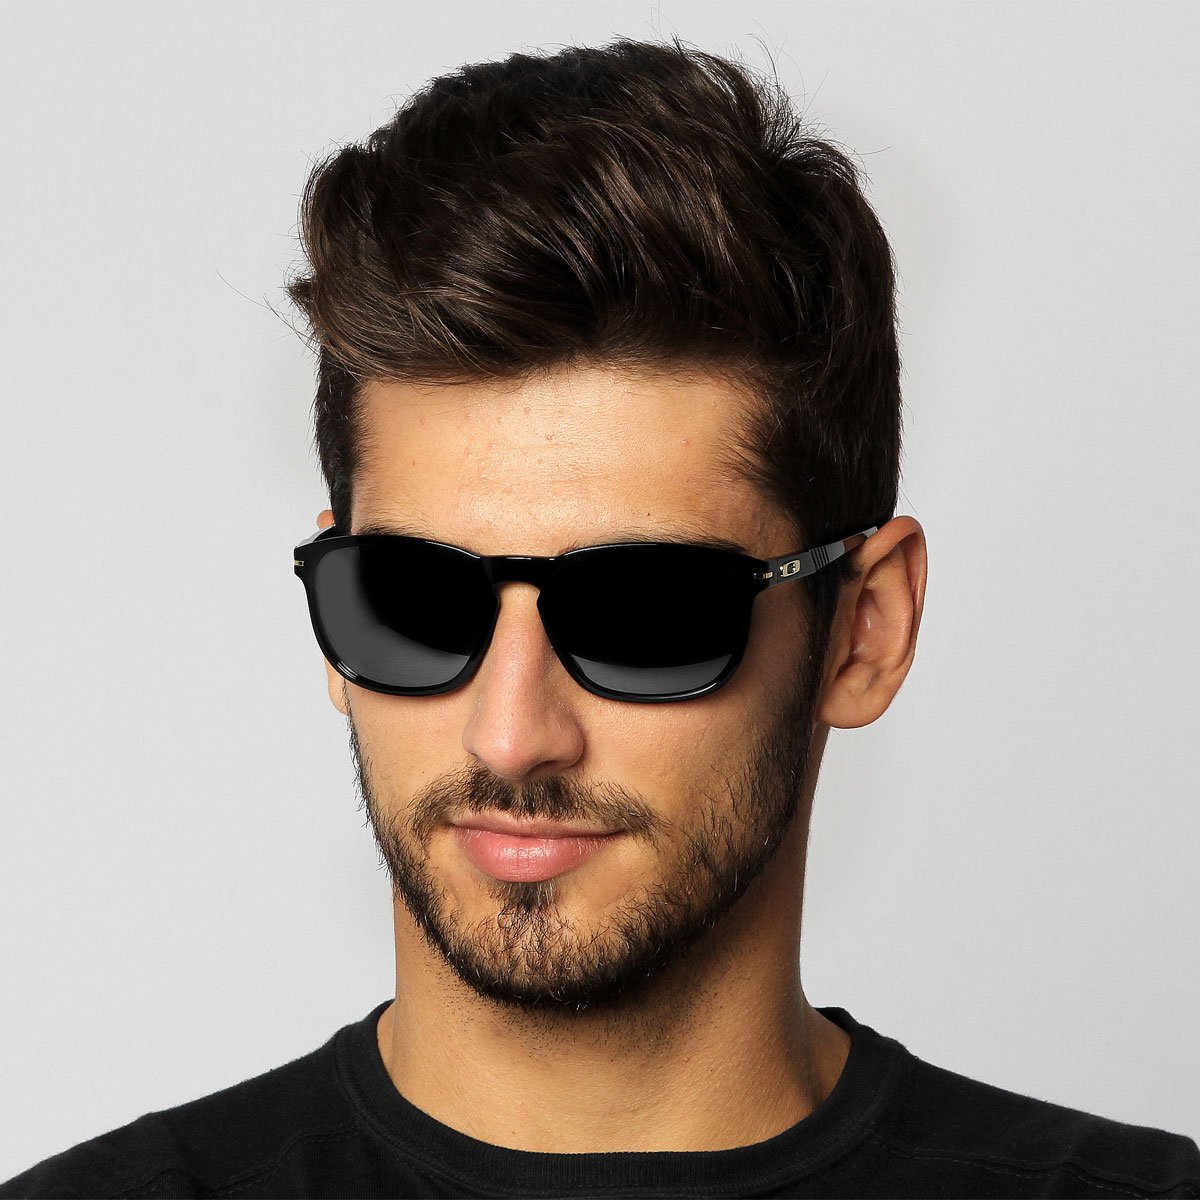 ... Óculos de Sol Oakley Shaun White Signature Series Enduro Iridium ... b351a02fcf